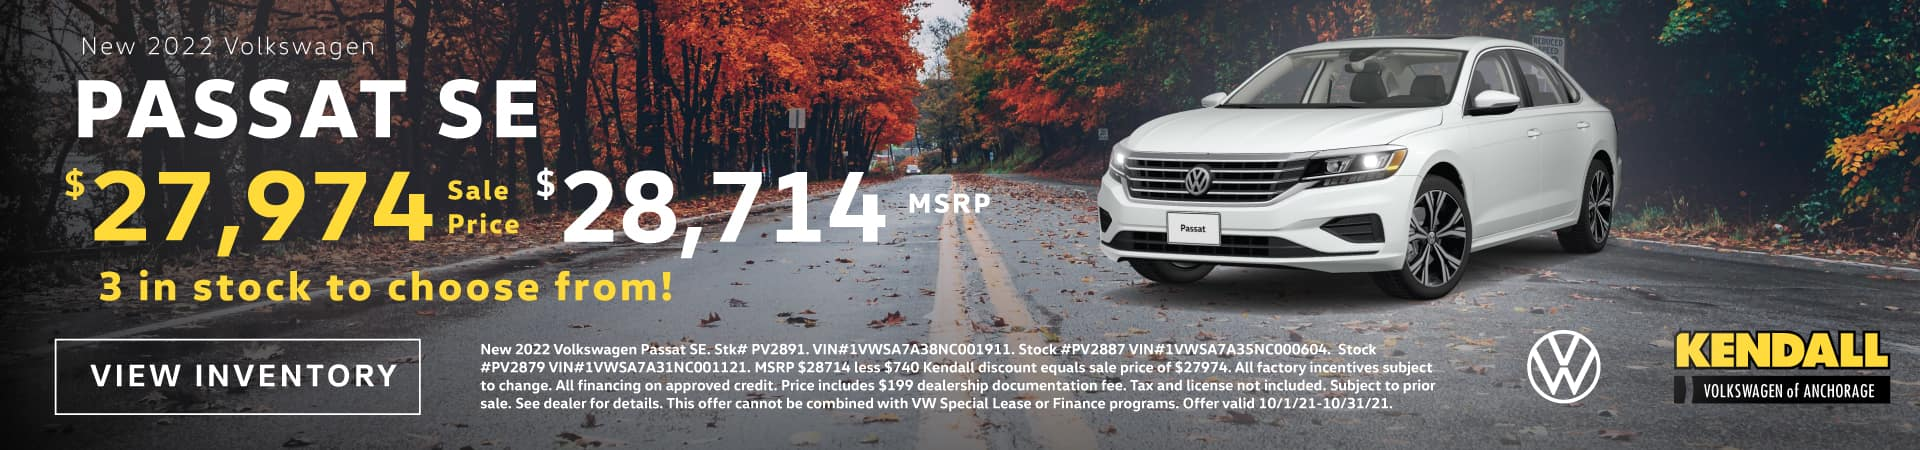 18020-AncVol-Oct21-Web-banners-PASSAT-2 REV